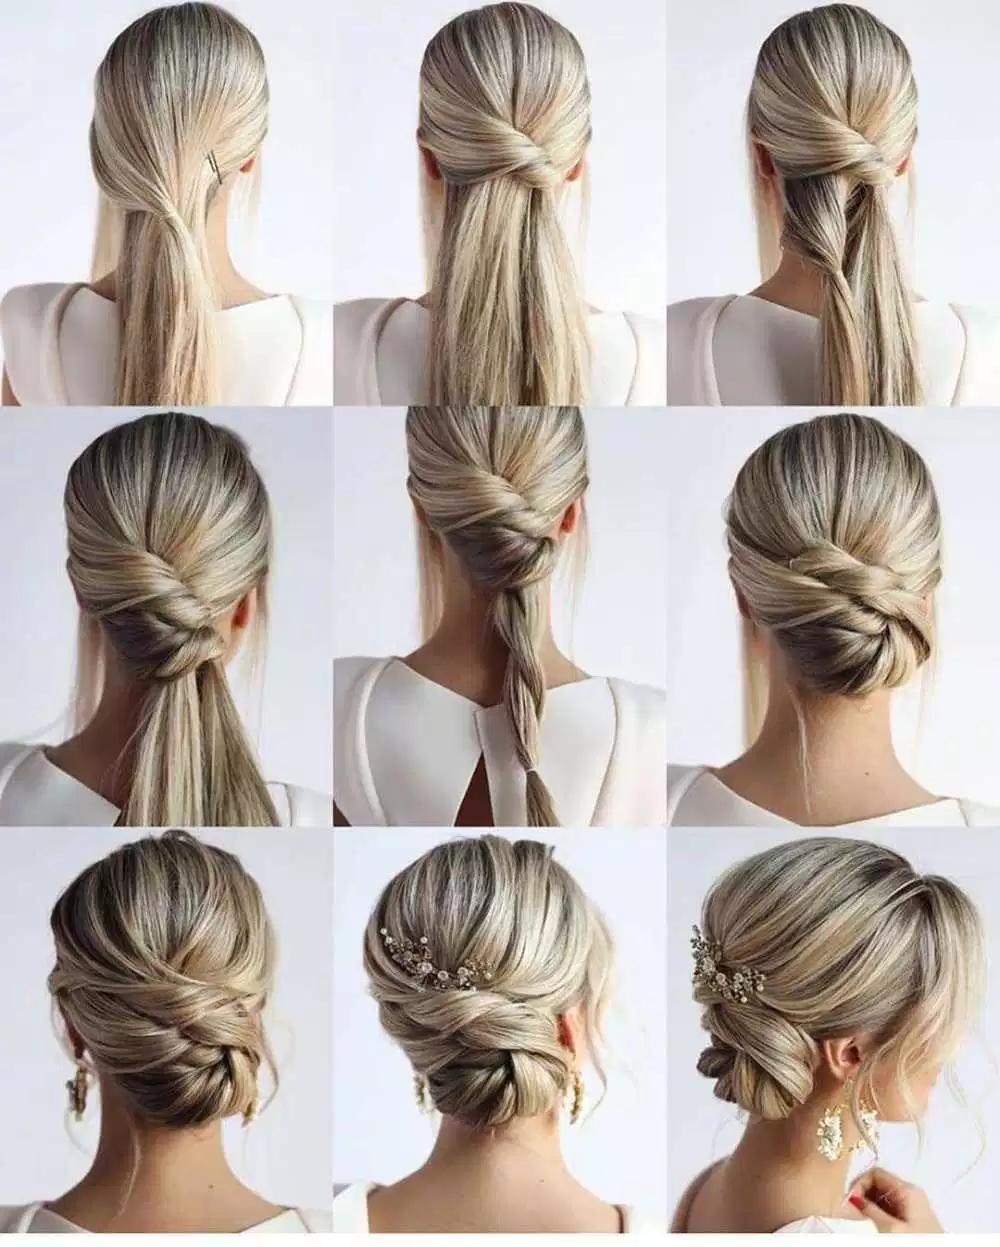 65 women's easy hairstyles step by step diy   easy